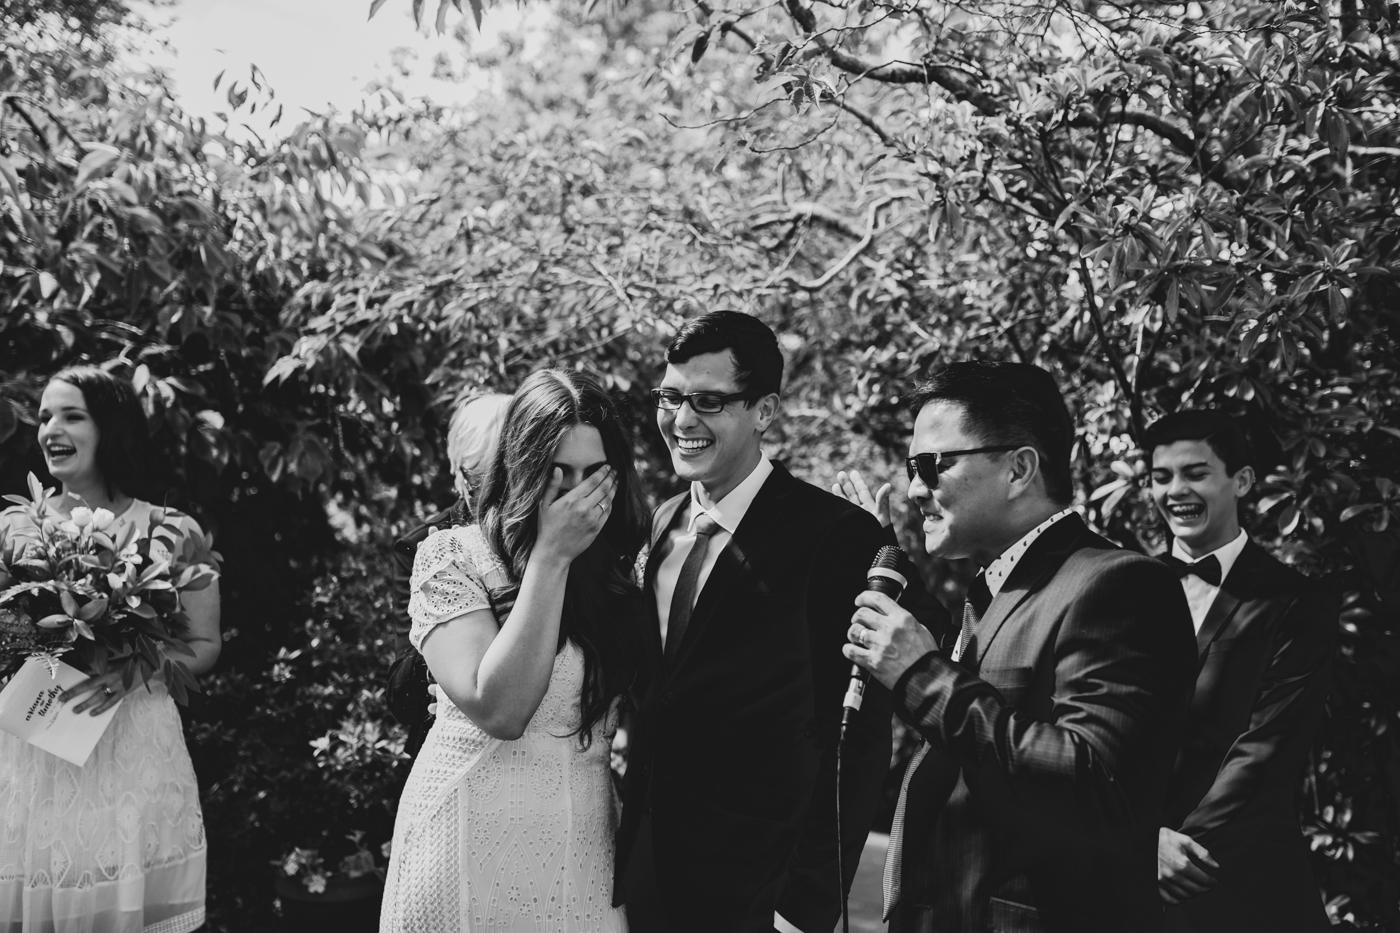 Ariana & Tim - Dunedin, New Zealand Wedding - Destination Wedding - Samantha Heather Photography-103.jpg